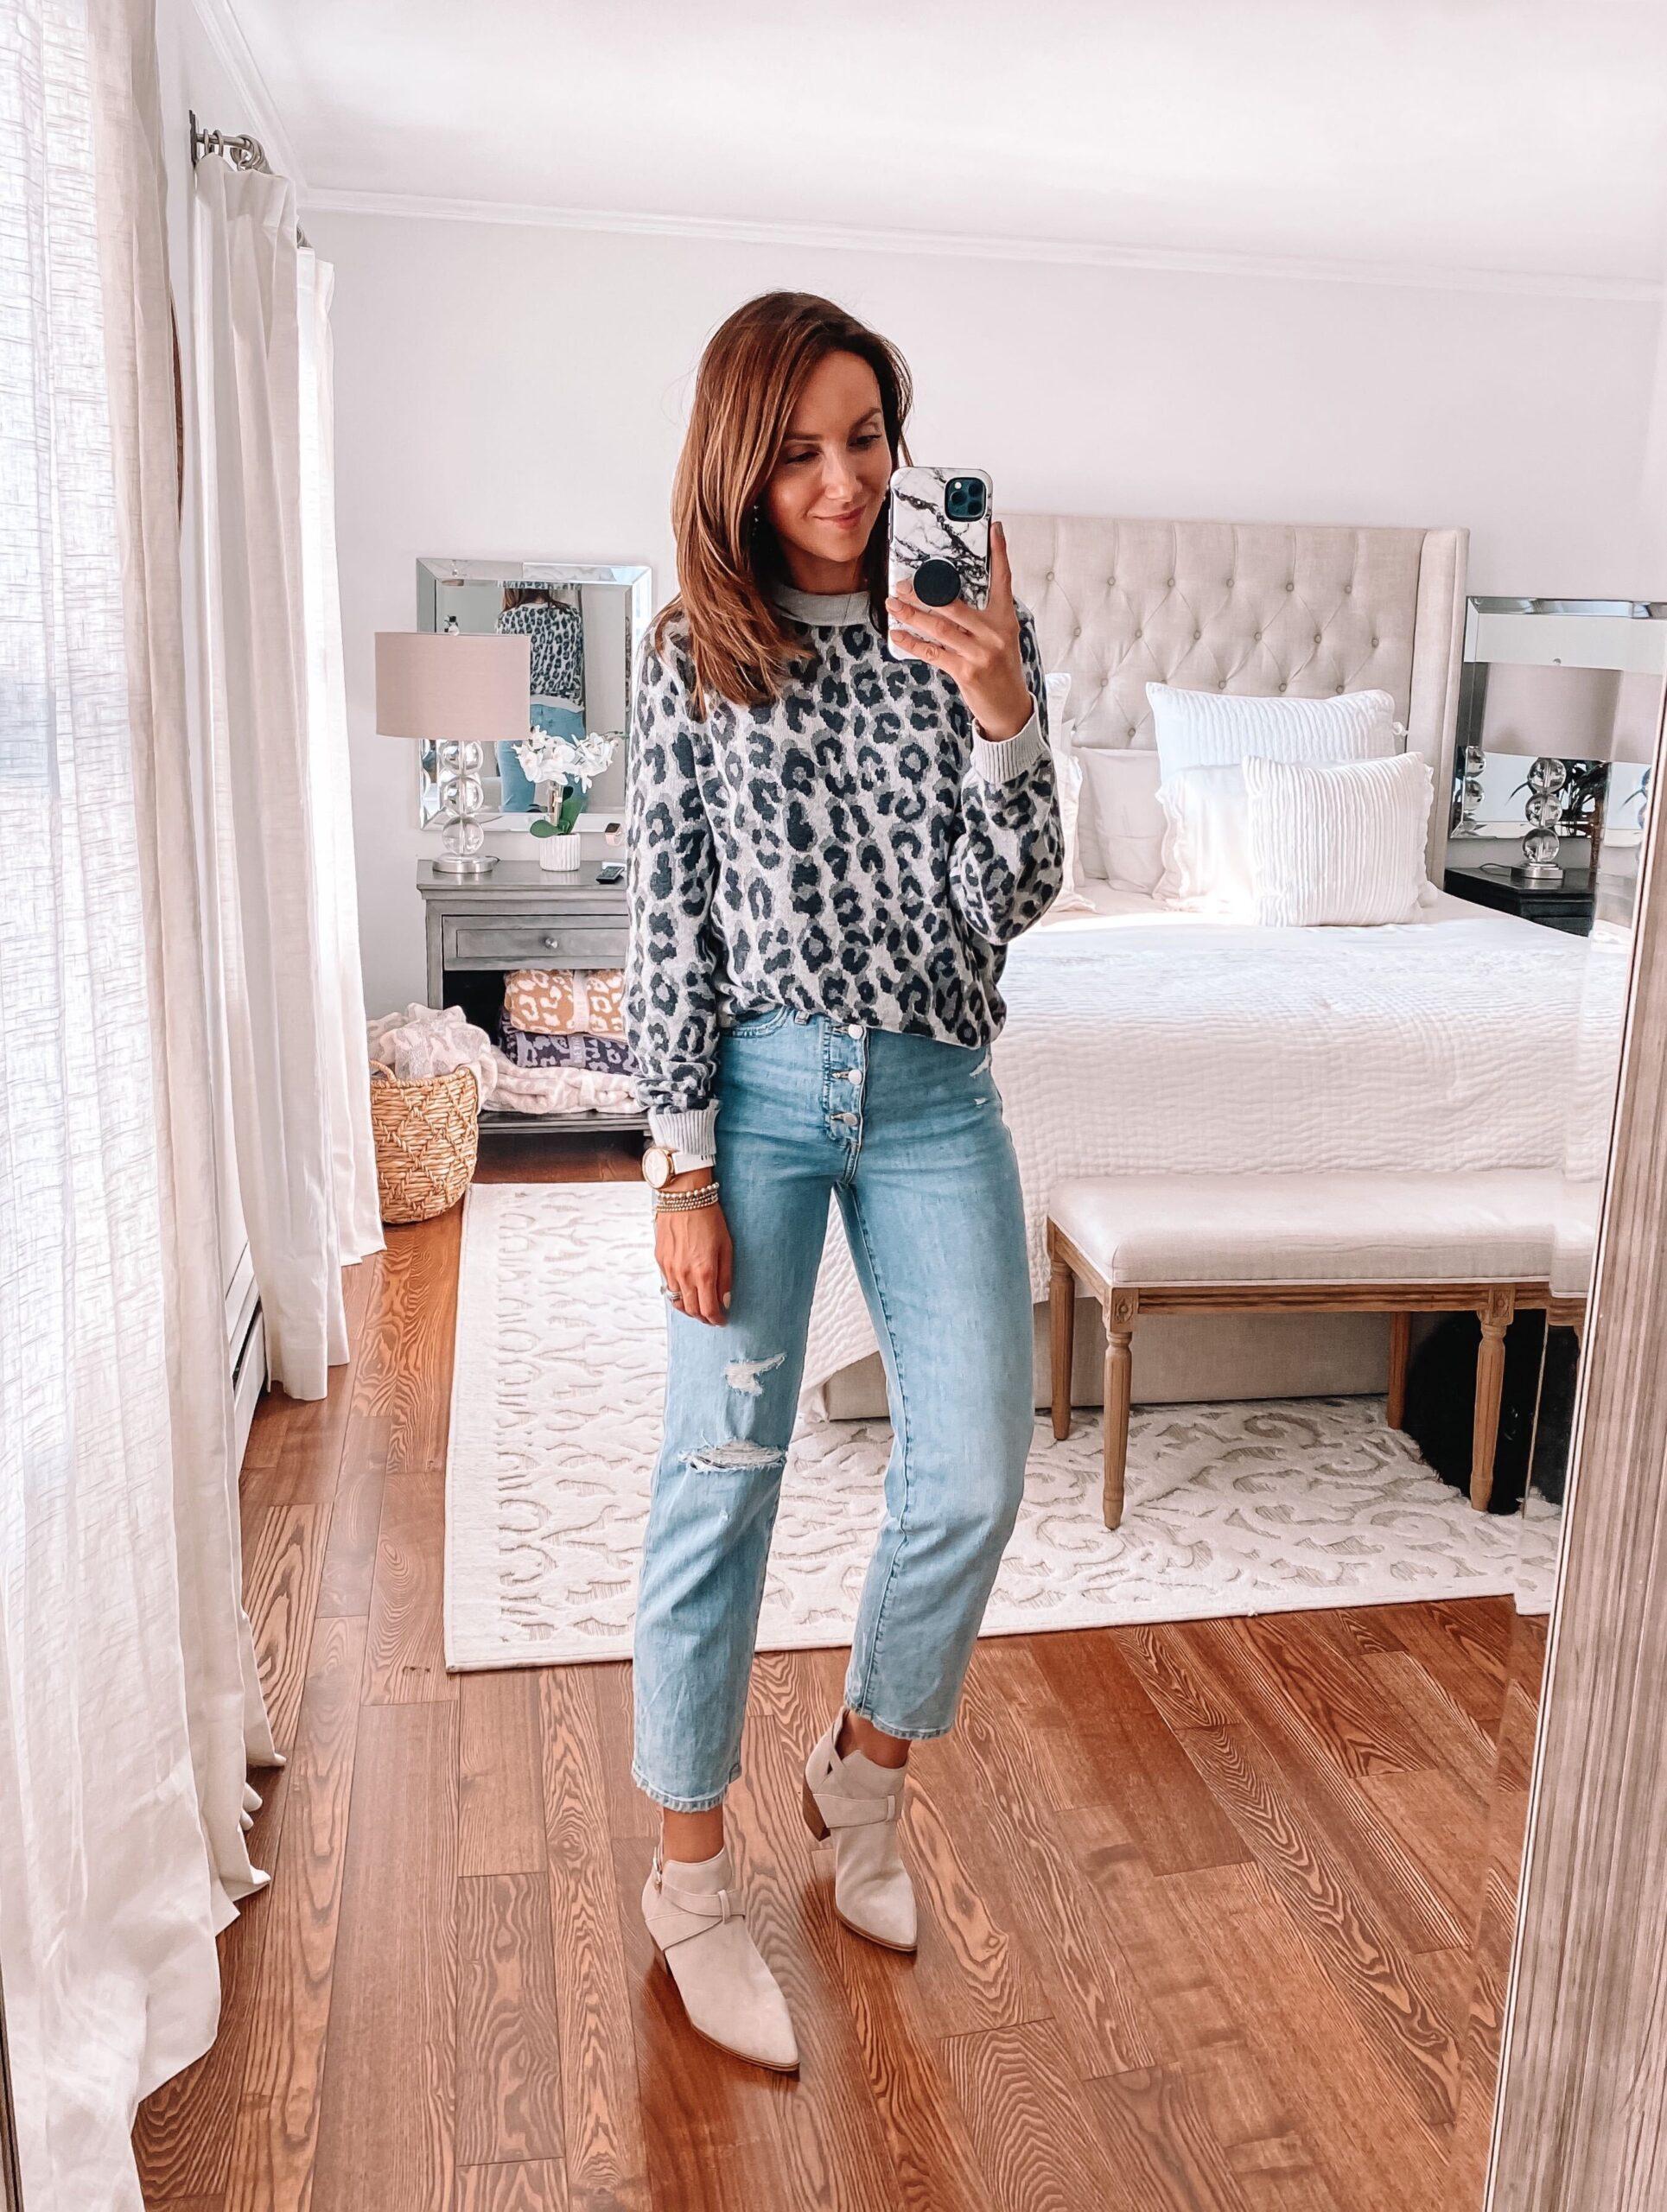 target finds, leopard sweatshirt, target jeans